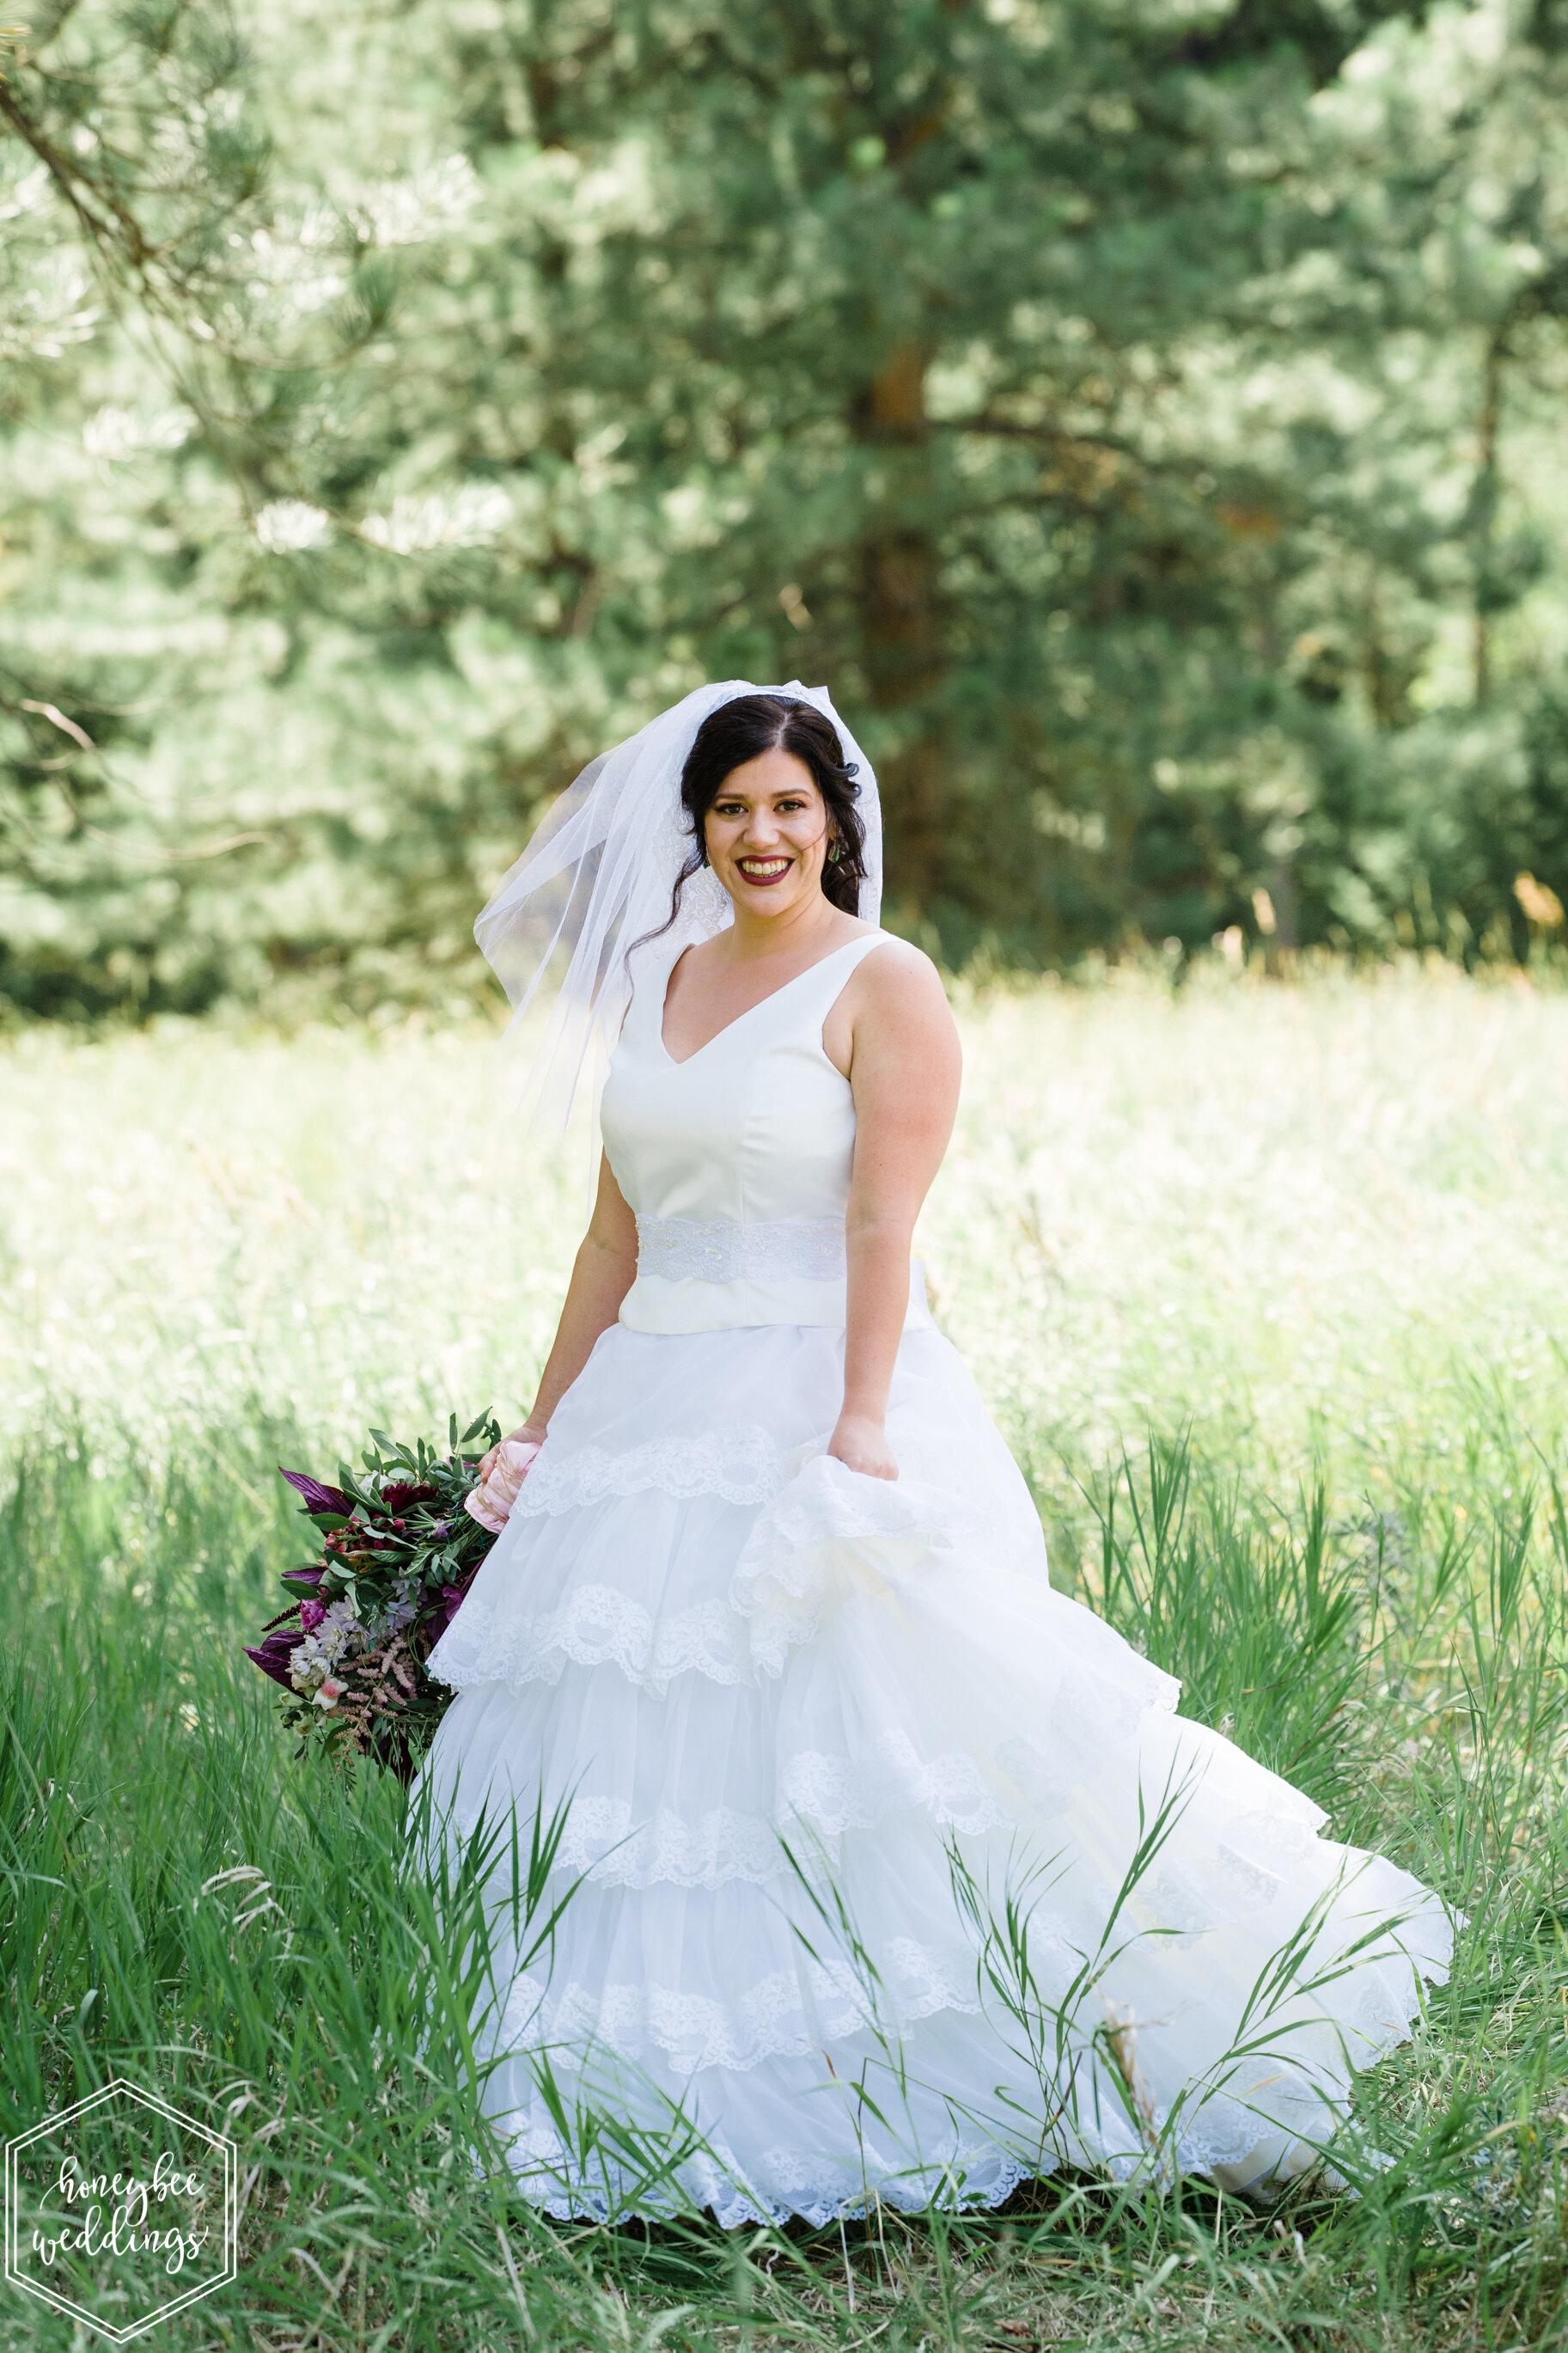 034White Raven Wedding_Montana Wedding Photographer_Rebekah & Likom_Honeybee Weddings_July 27, 2019-2815.jpg